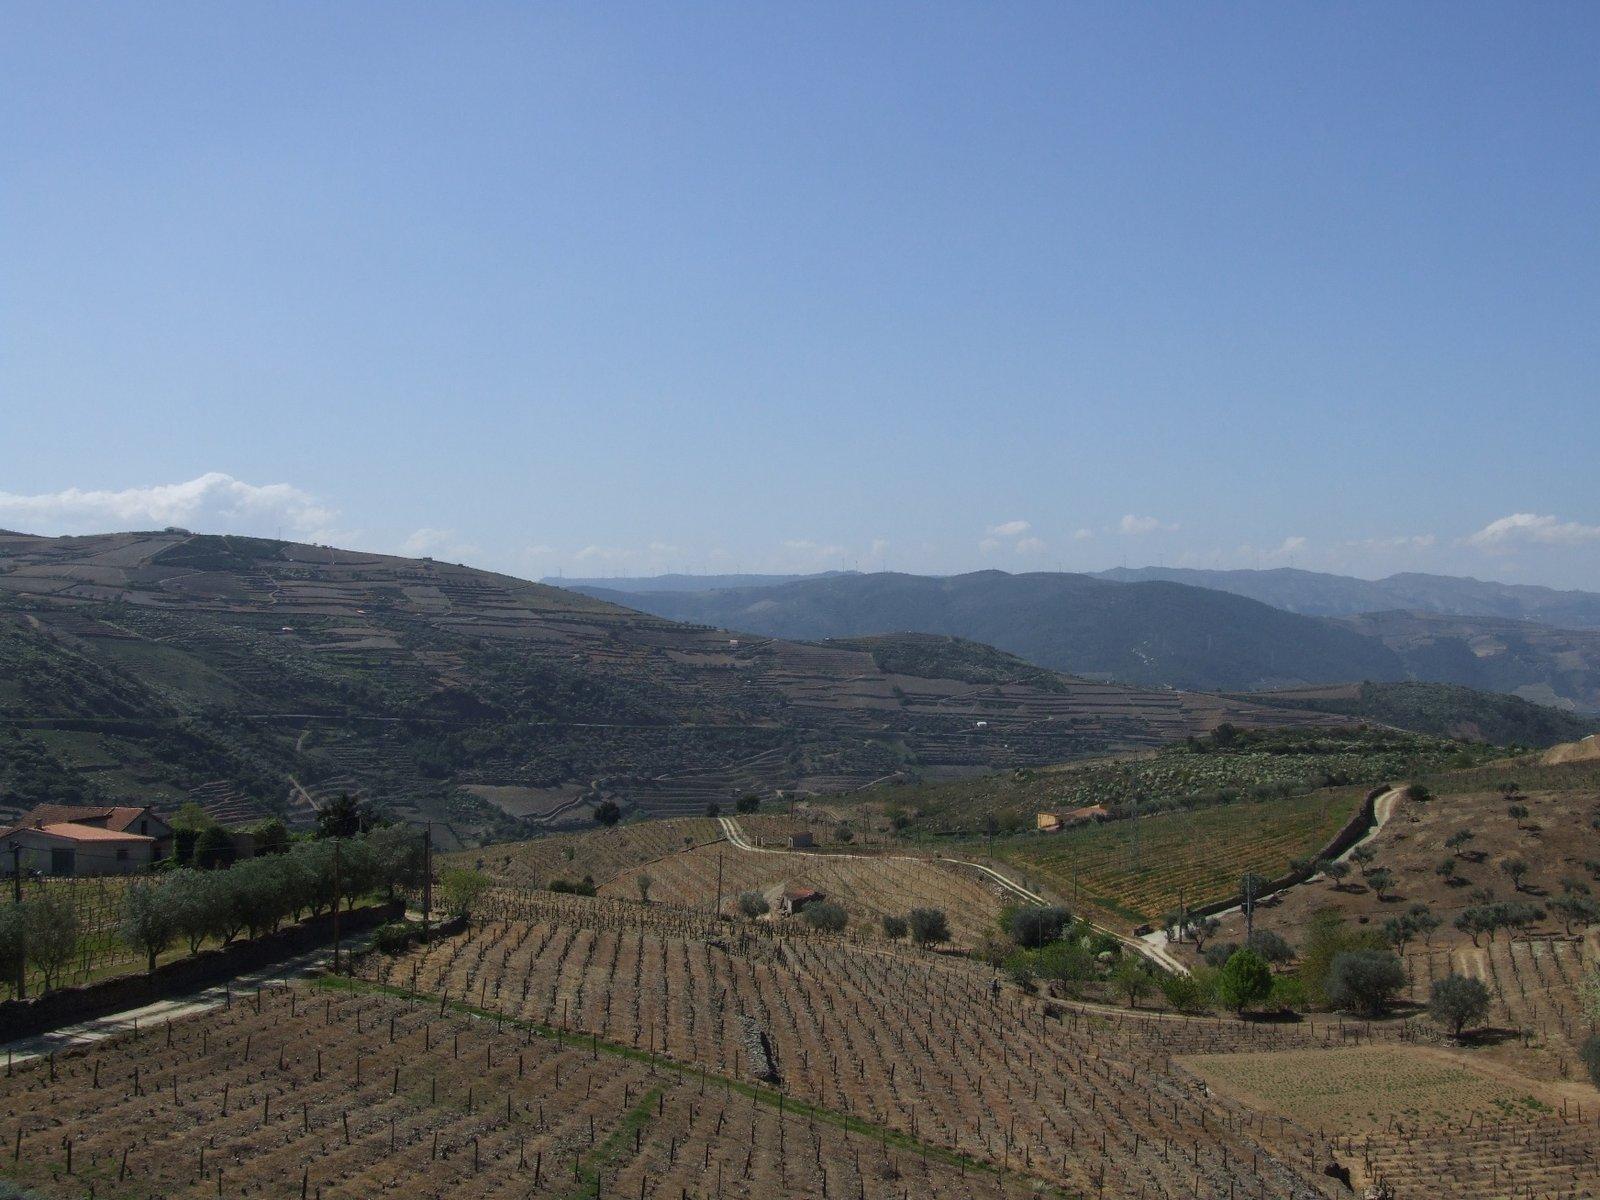 Nelson_Carvalheiro_Douro_Valley (6)